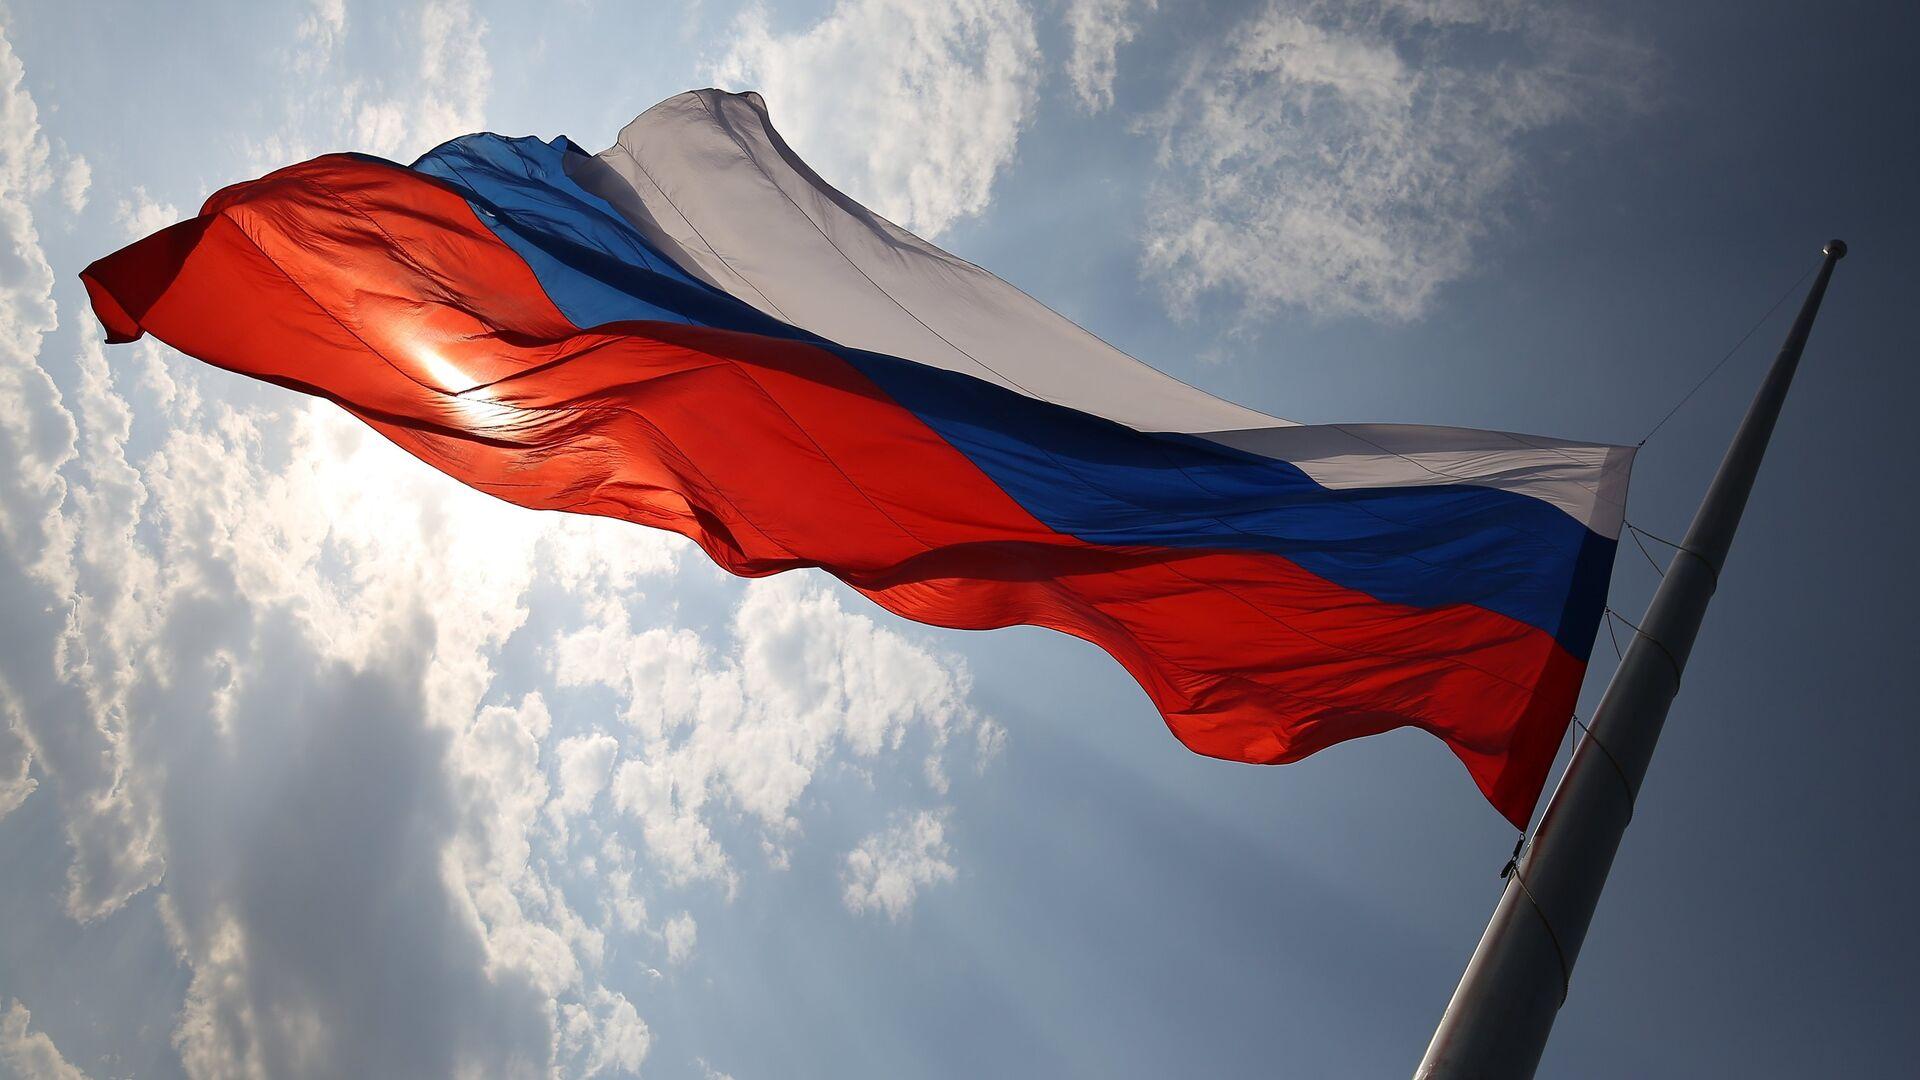 Празднование Дня Государственного флага РФ в Краснодаре - РИА Новости, 1920, 25.12.2020